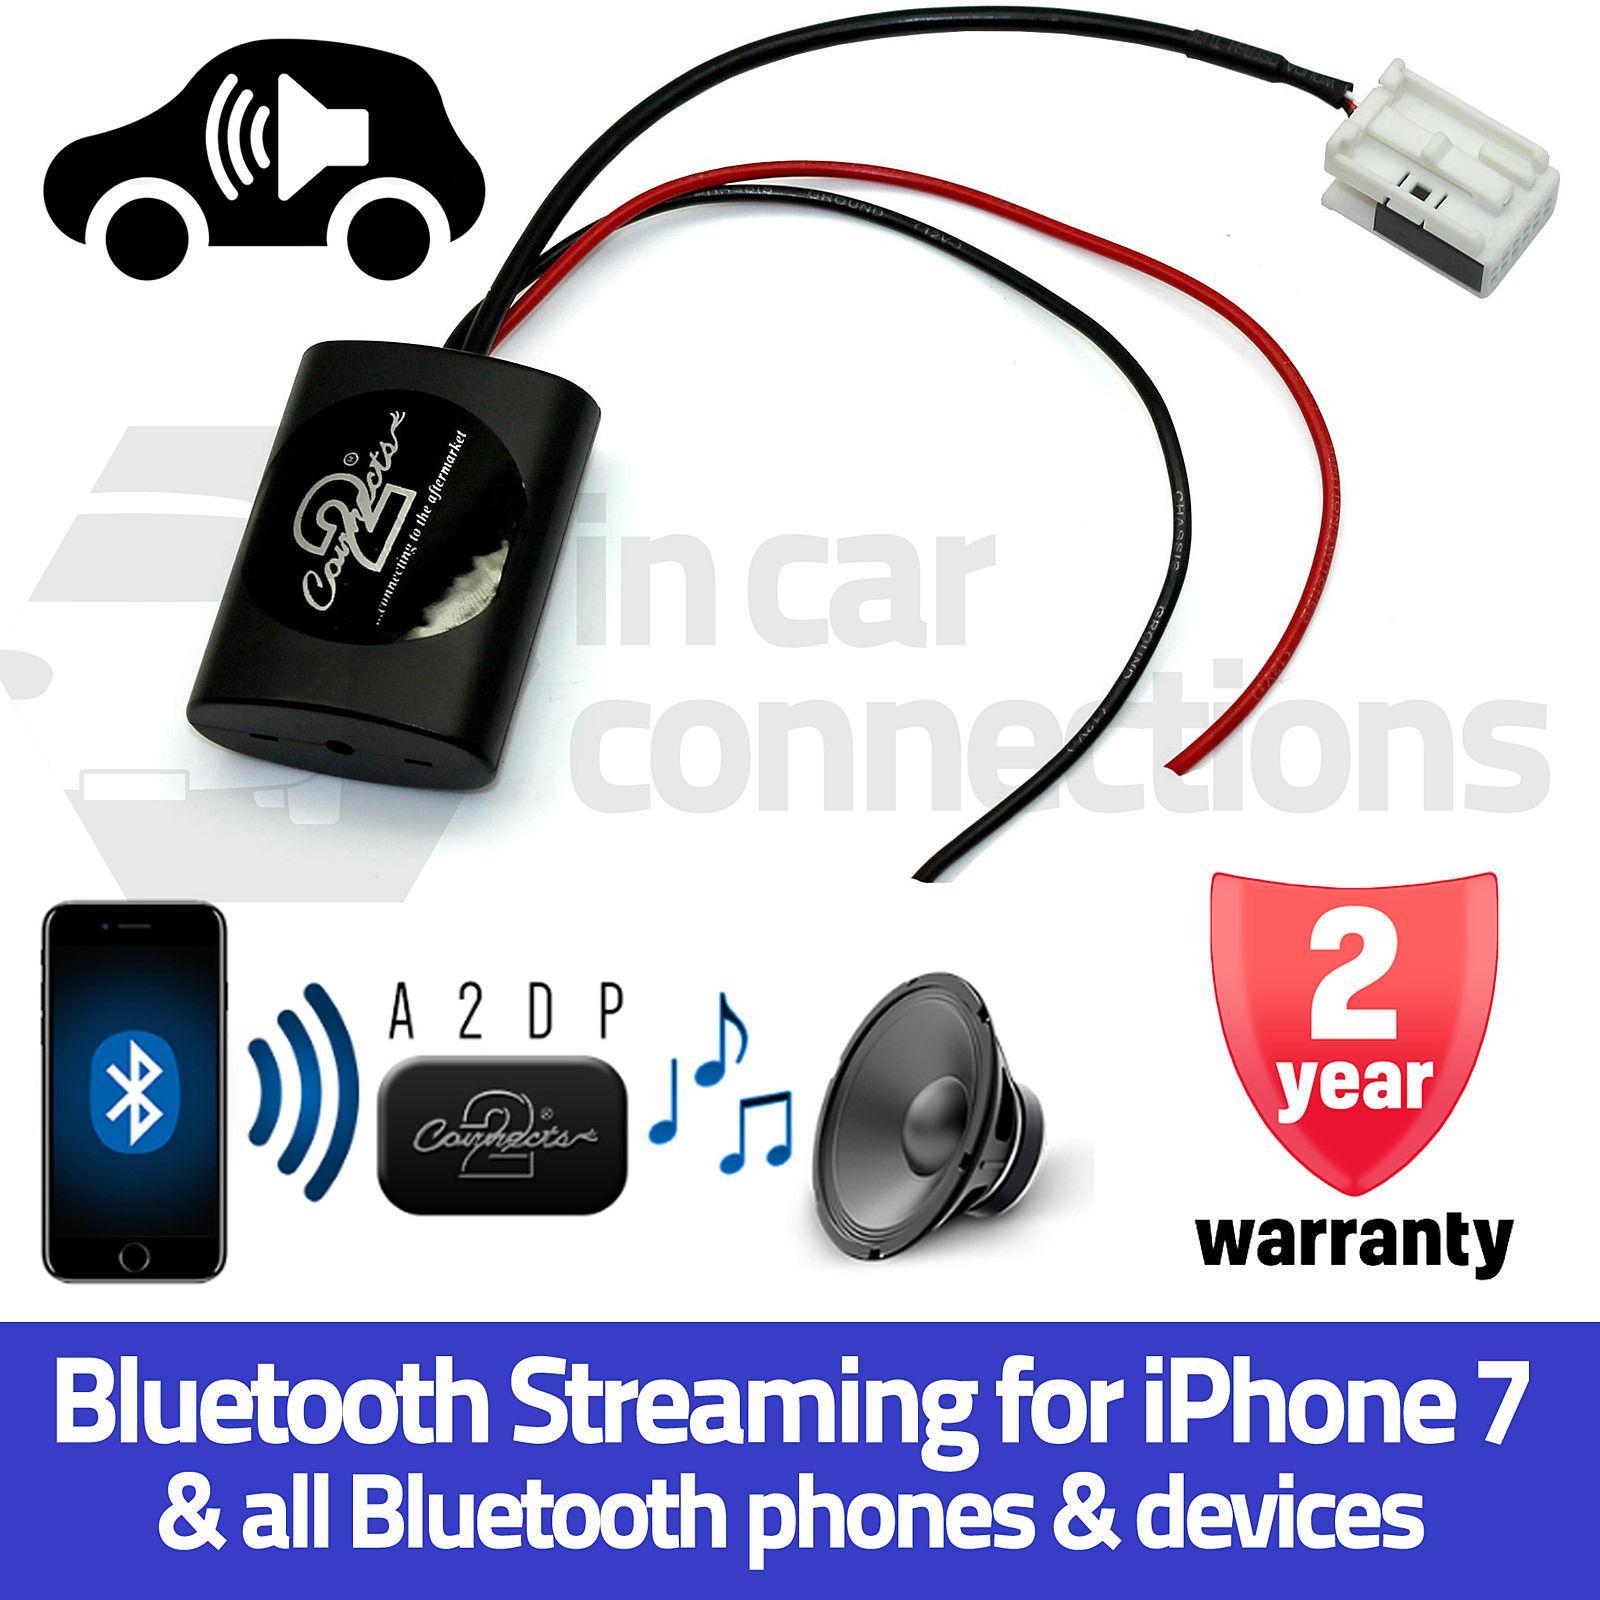 systeme bluetooth a2dp pour autoradio d 39 origine audio lectronique embarqu e forum audi a3. Black Bedroom Furniture Sets. Home Design Ideas